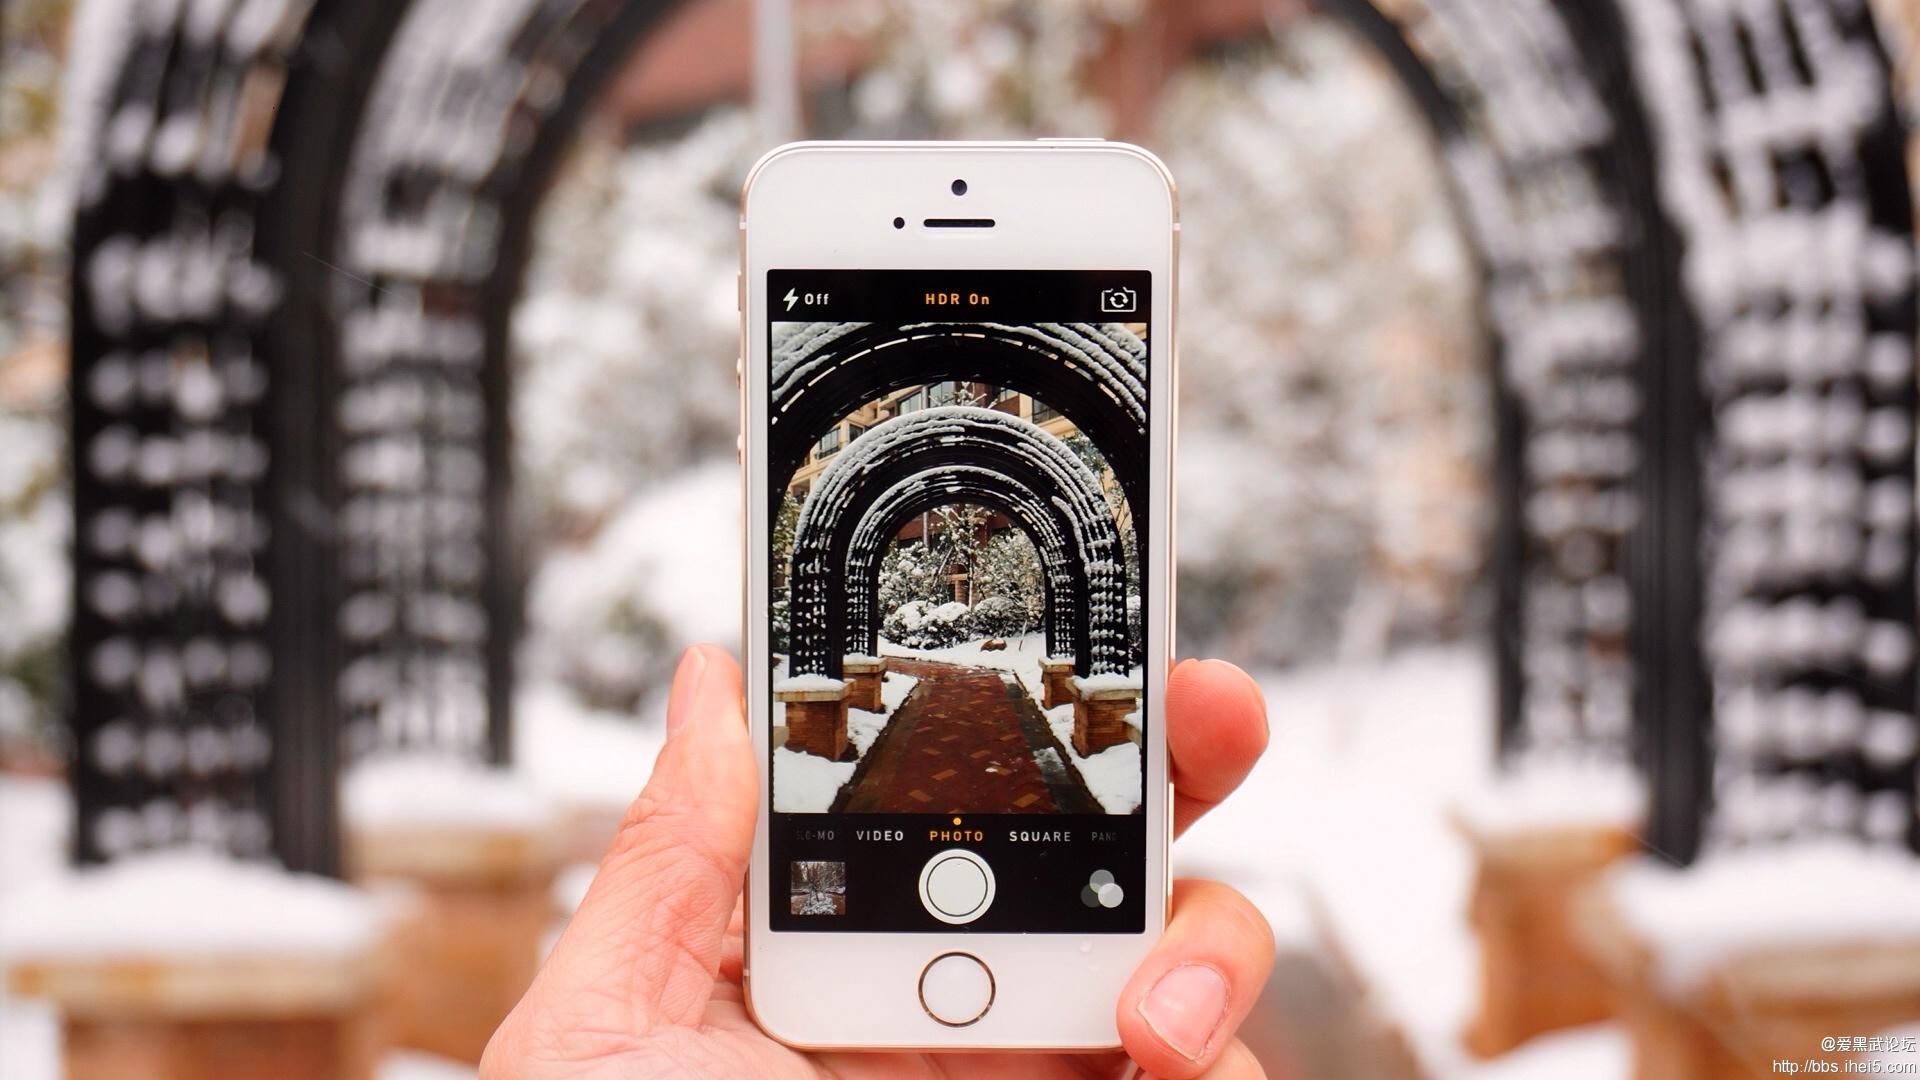 iphone 5s1.jpg